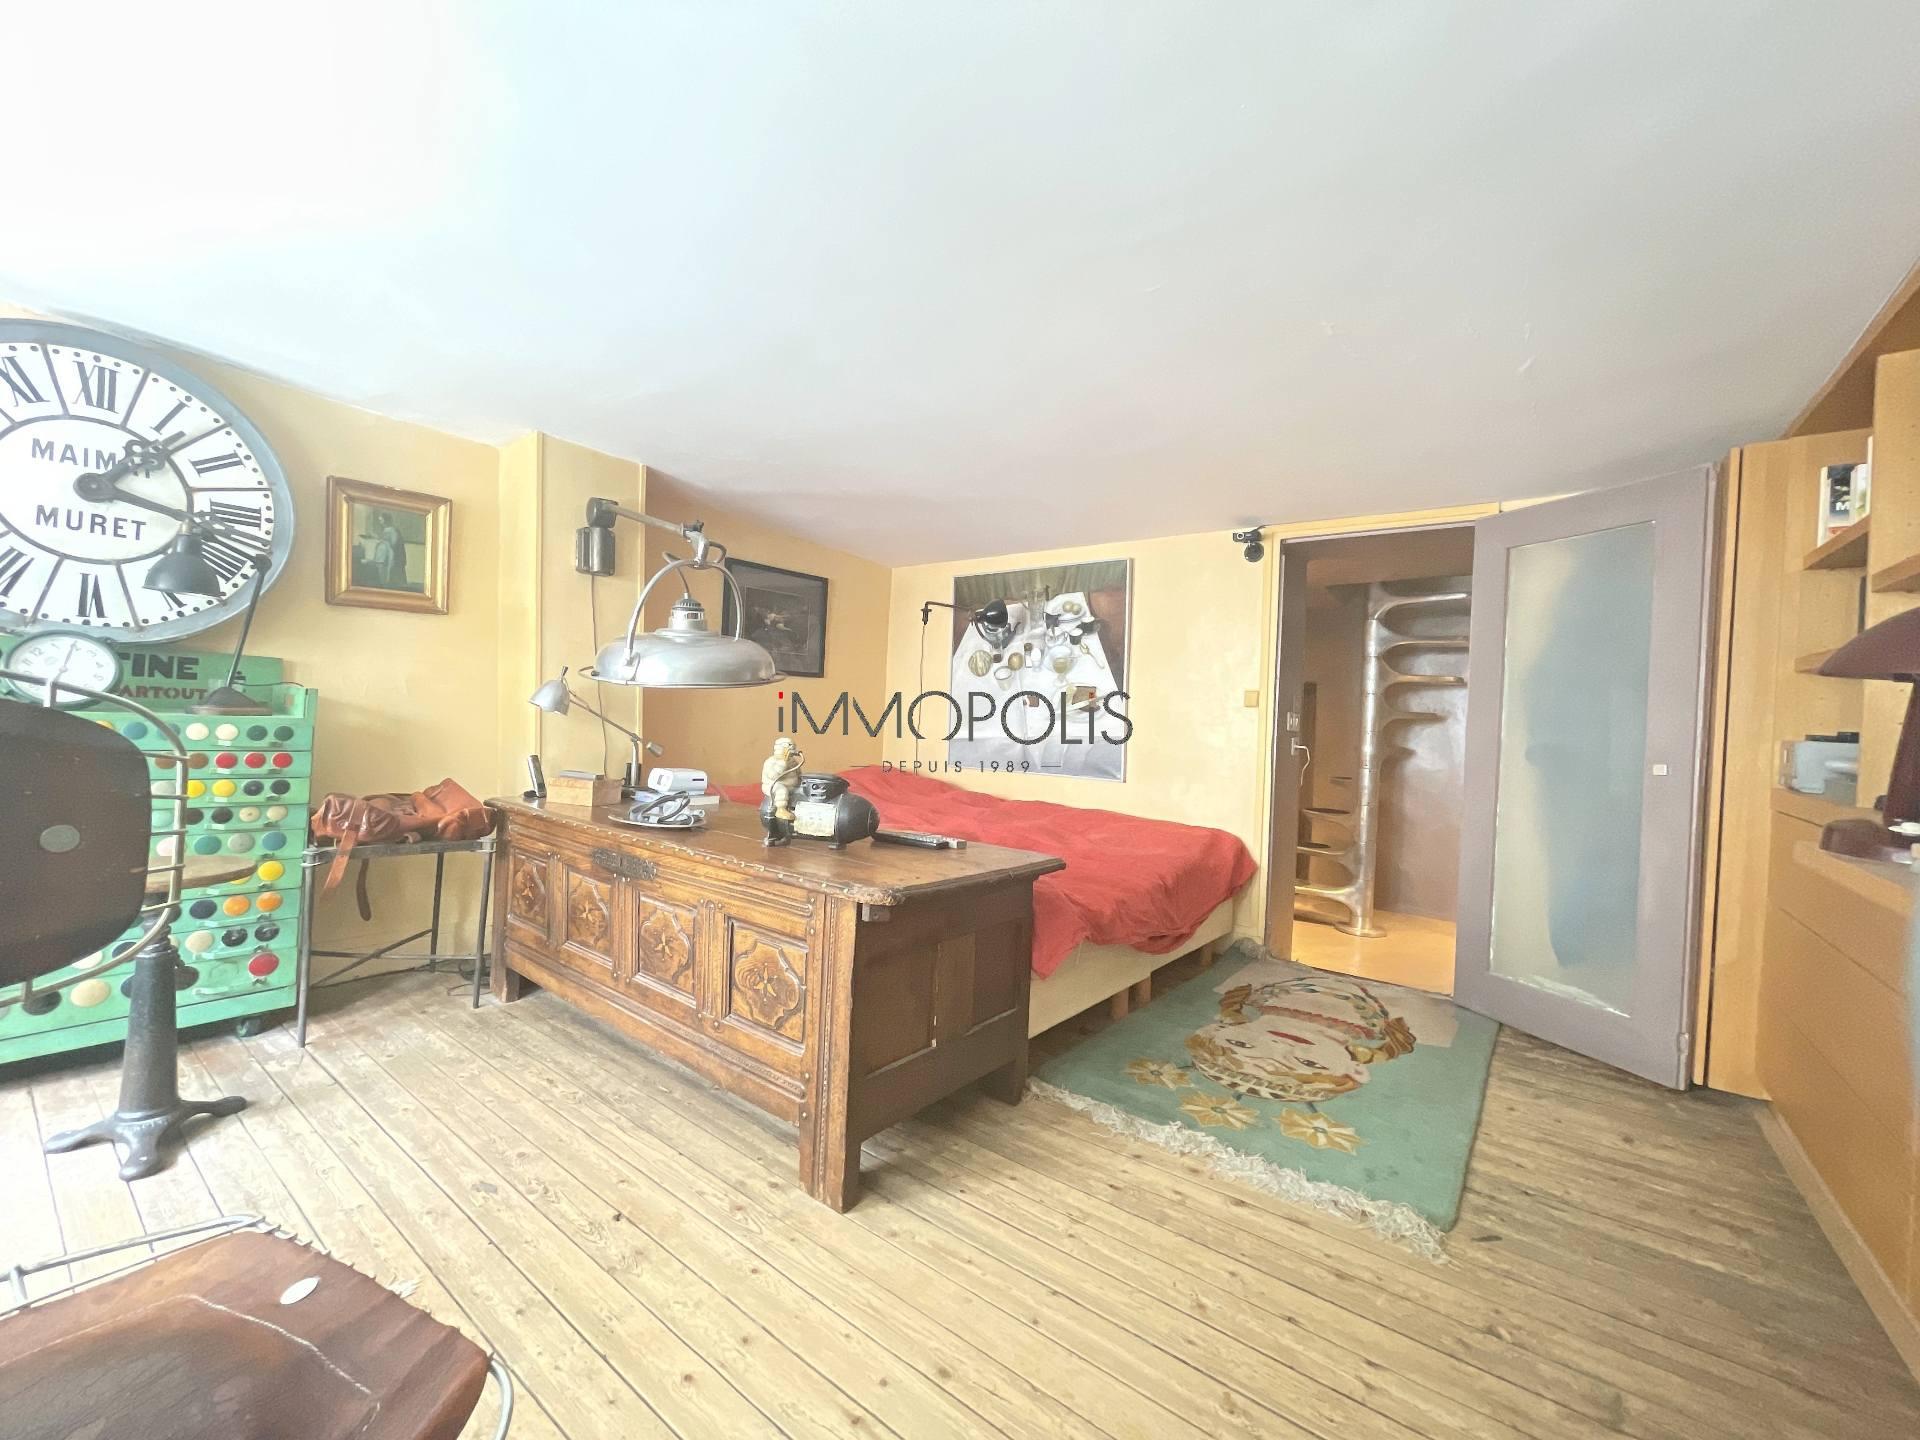 3 rooms Rue Ravignan duplex + room of service! 5